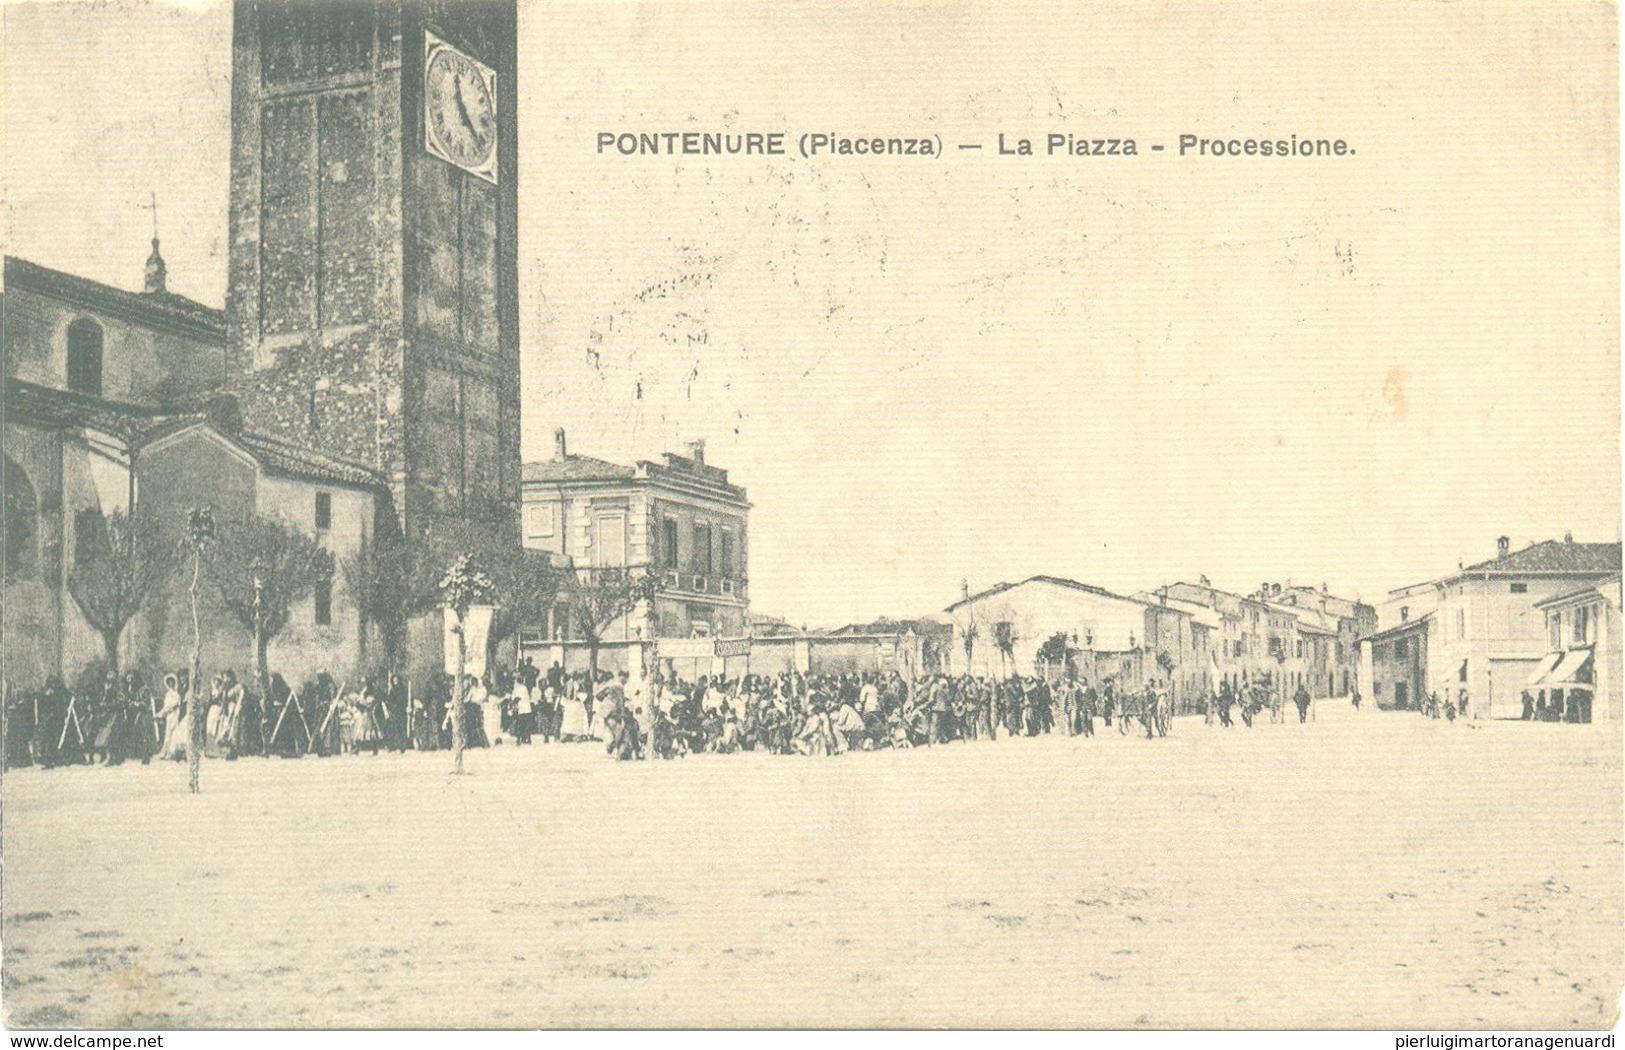 13203 - Pontenure - La Piazza - Processione (Piacenza) F - Piacenza